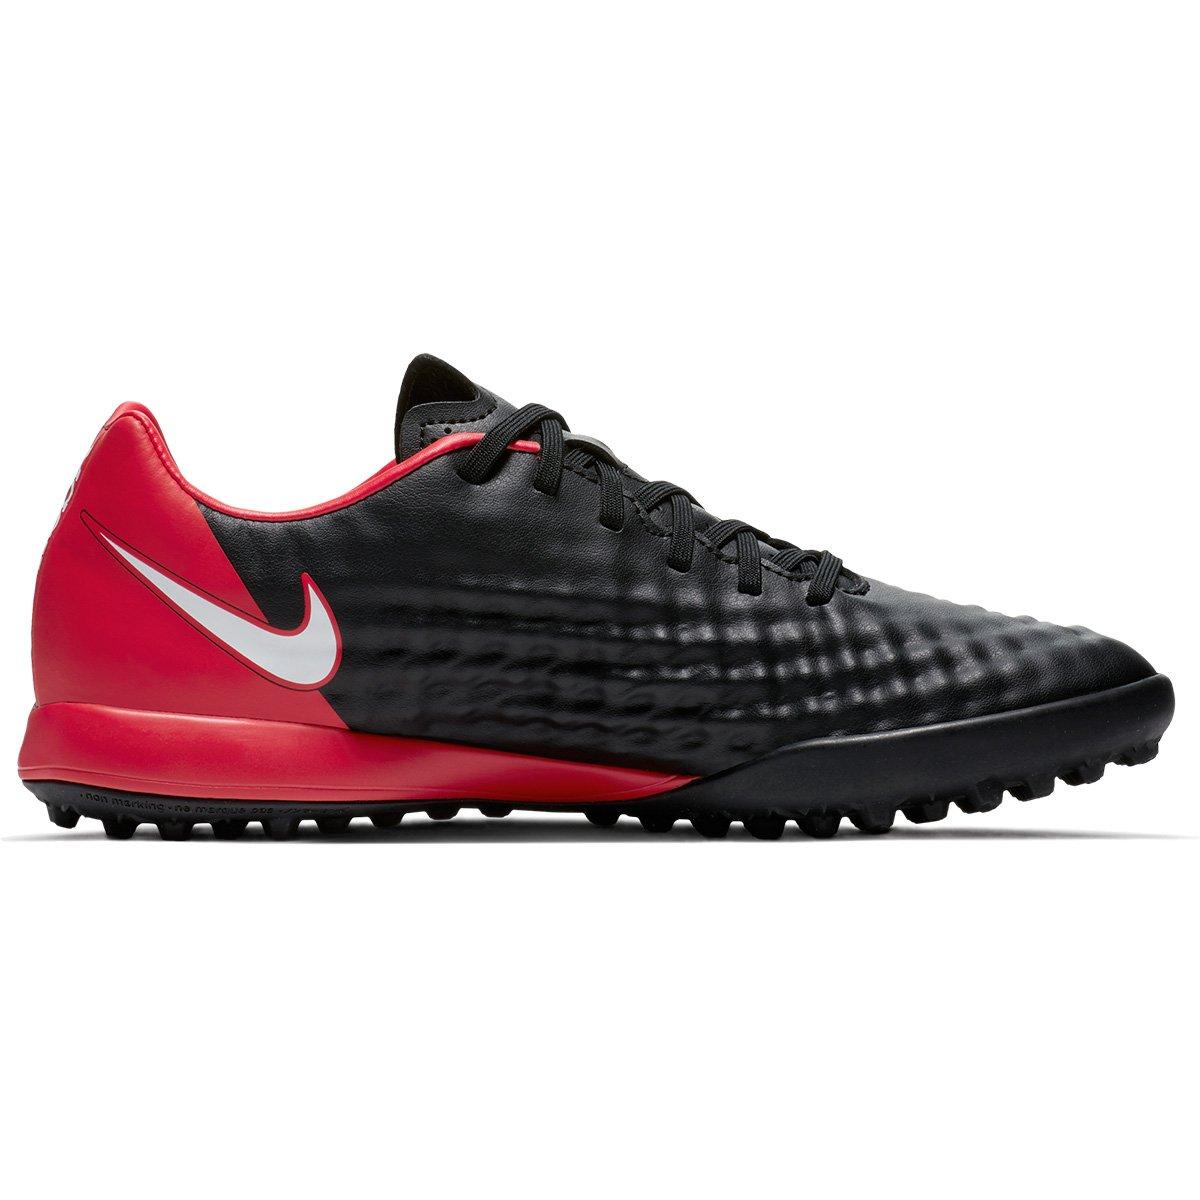 Chuteira Society Nike Magista Onda II TF - Preto e Branco - Compre ... 072a70f6733d1